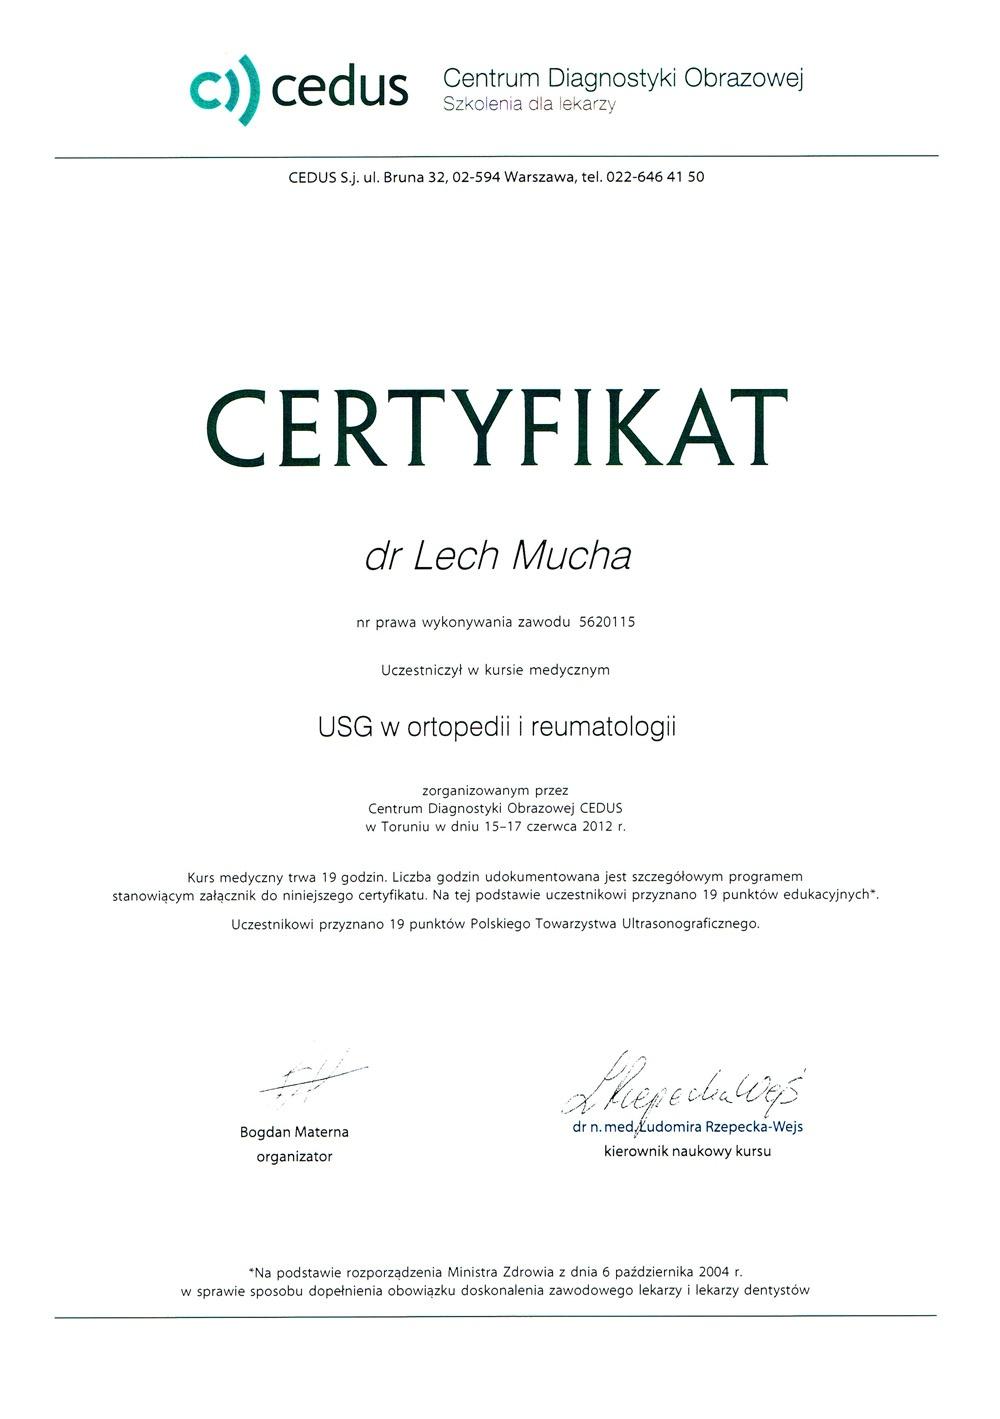 2012_06_15-17_lech_mucha_chiruria_zyl